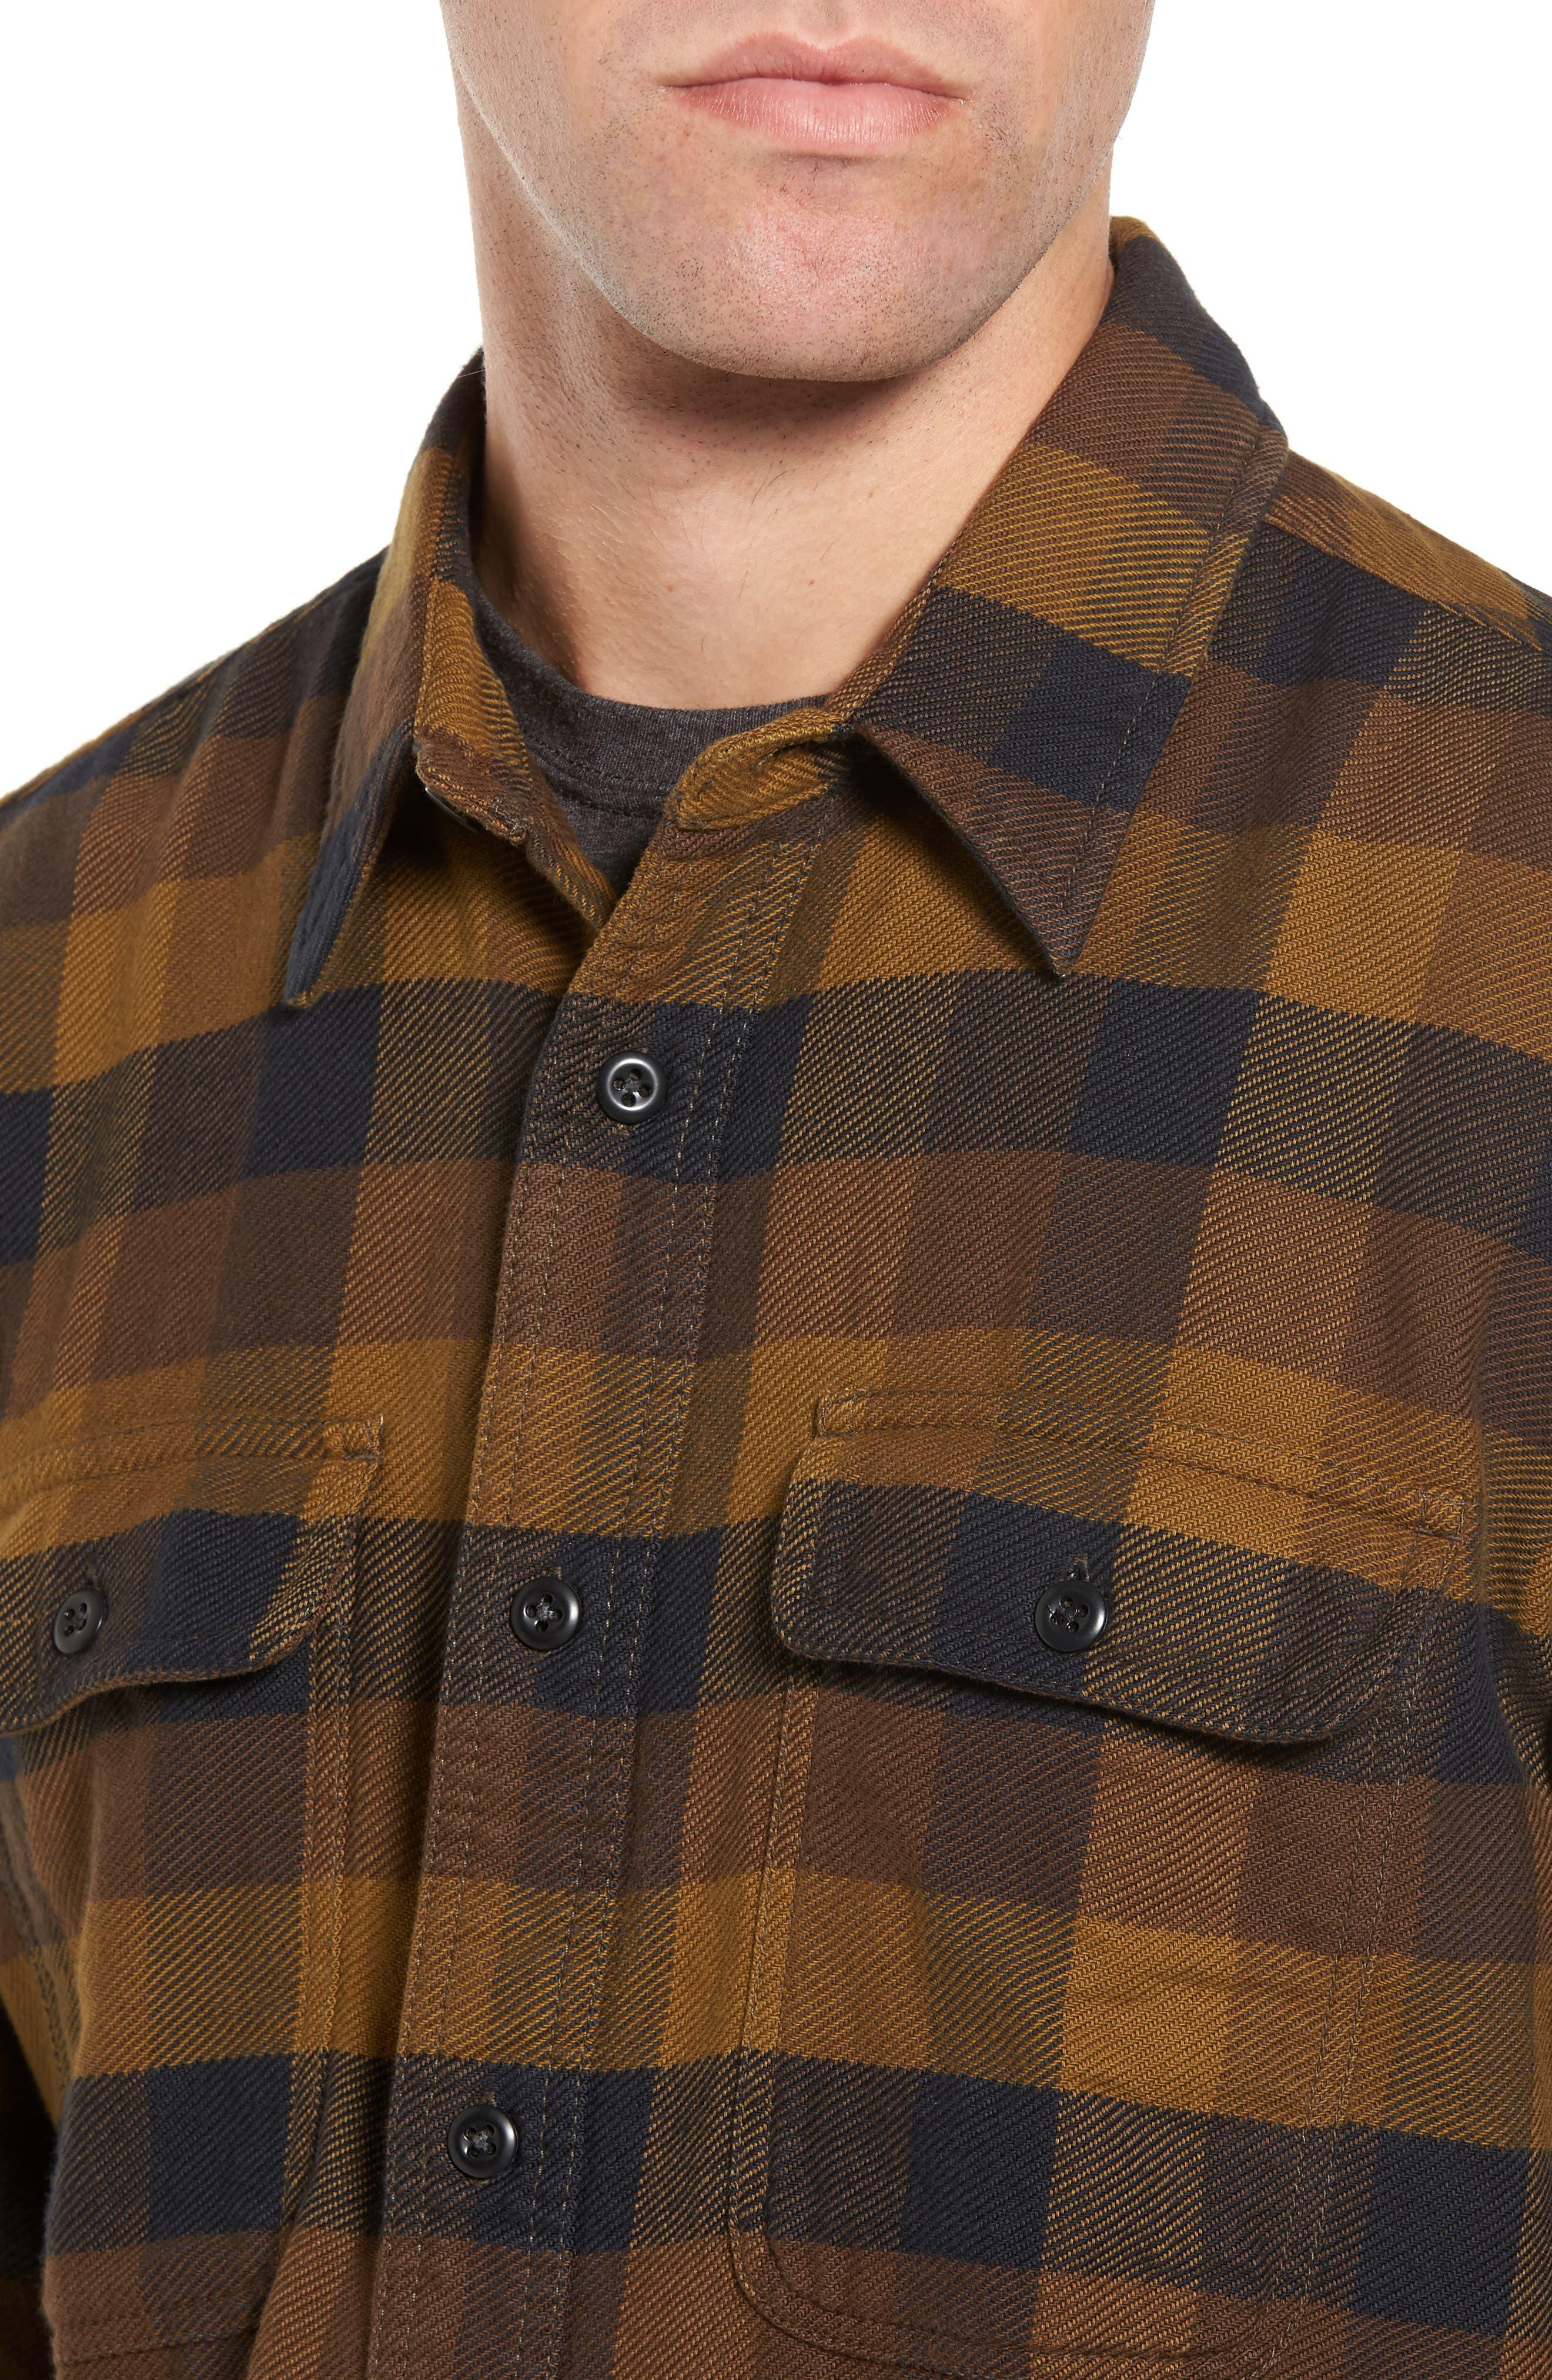 'Vintage Flannel' Regular Fit Plaid Cotton Shirt,                             Alternate thumbnail 4, color,                             Brown/ Navy